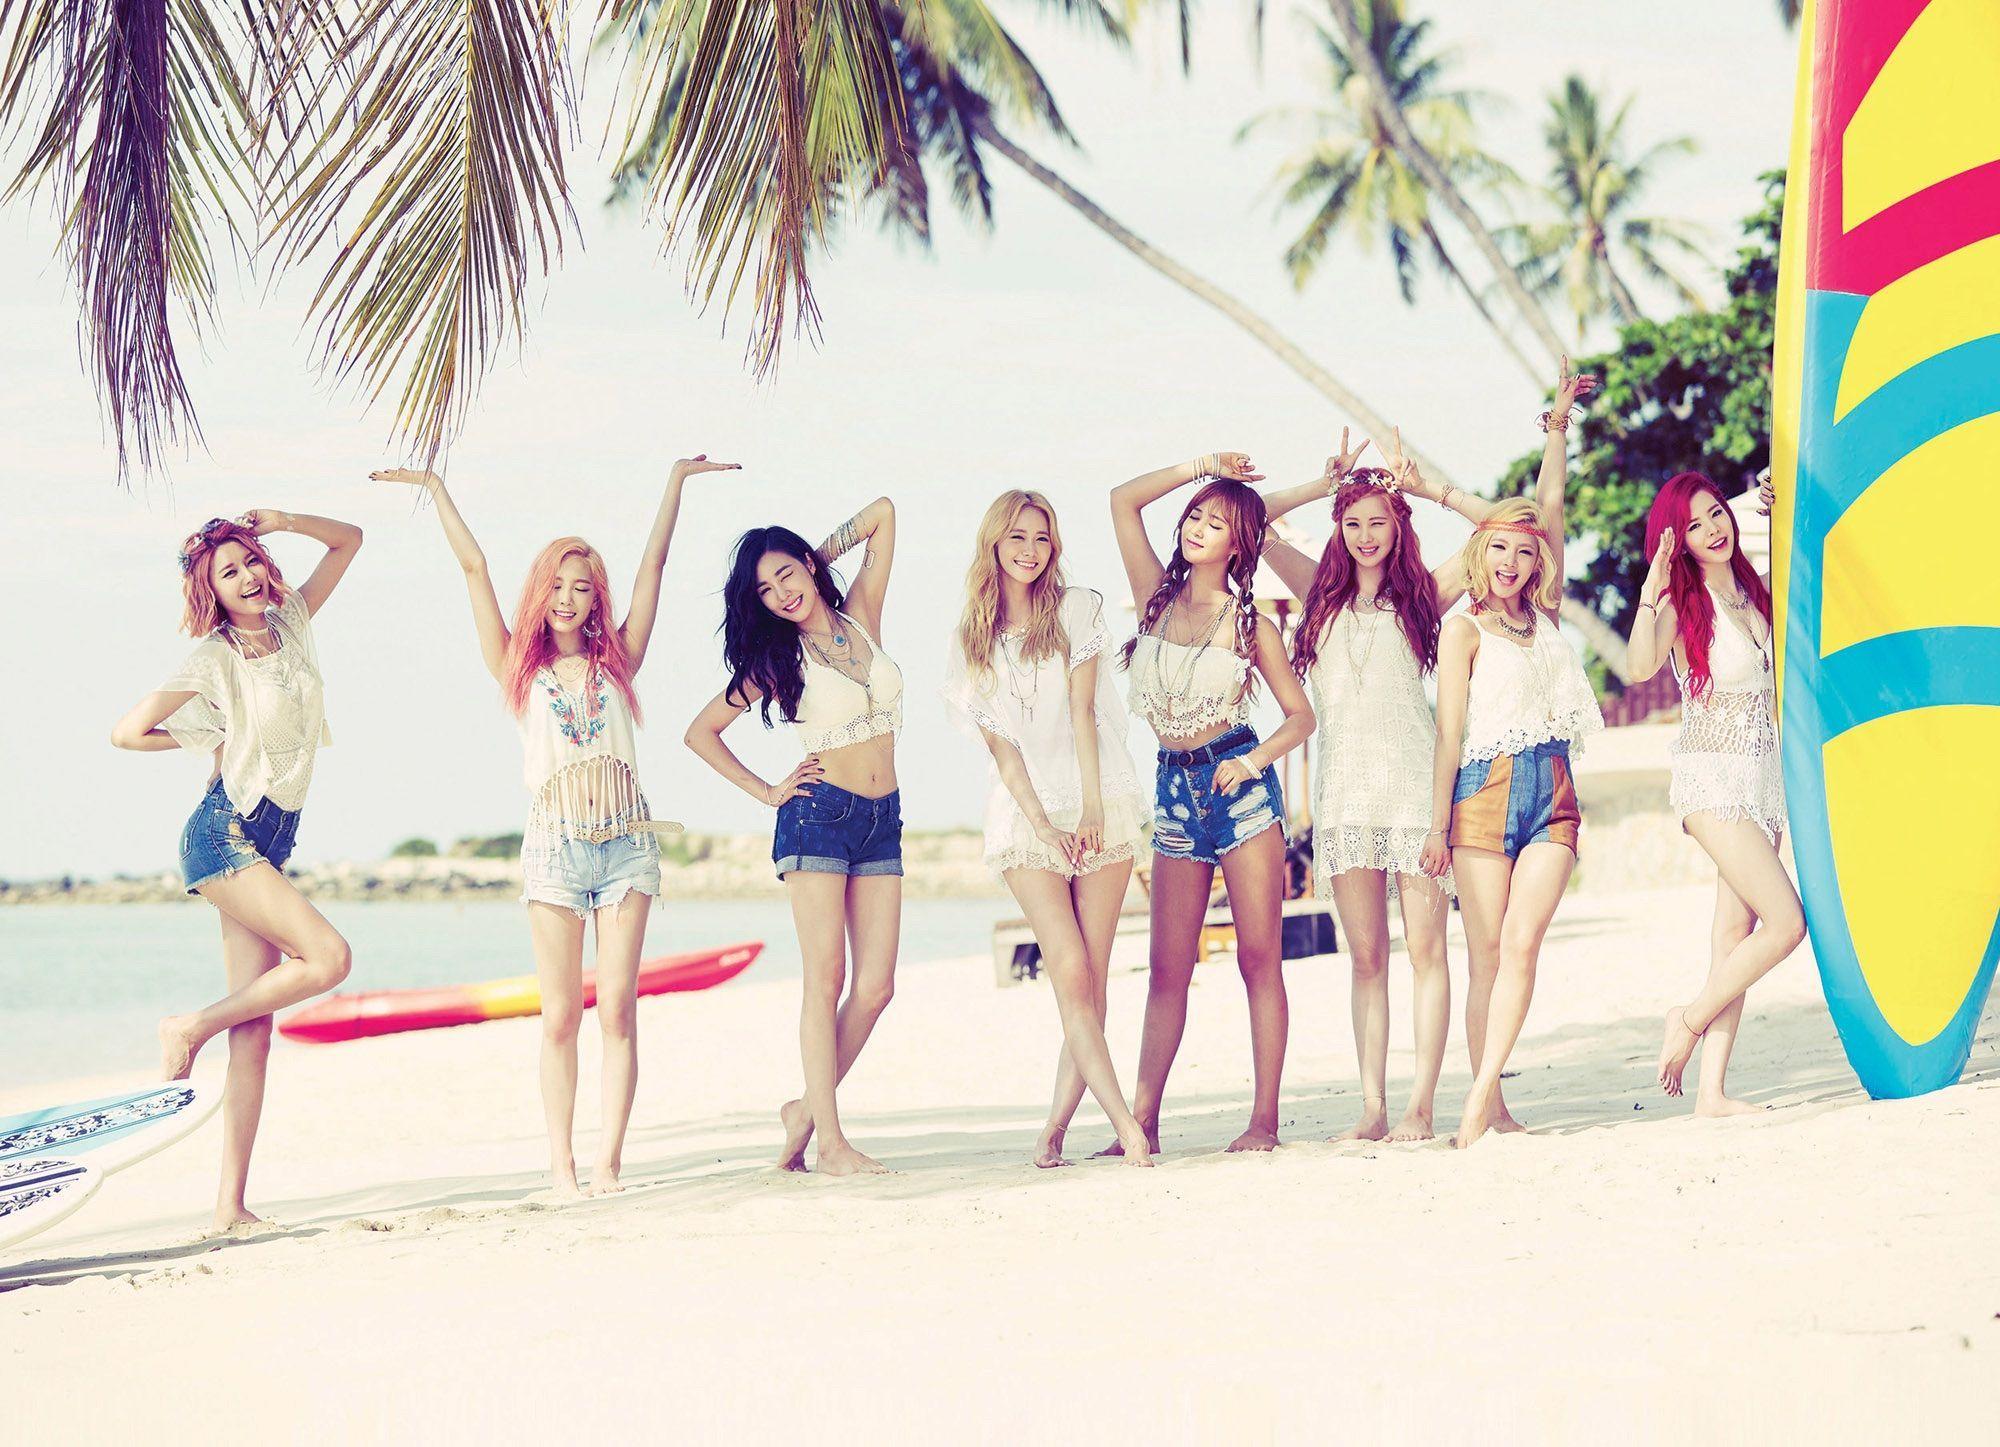 161014 Casio Baby G With Girls Generation 2016 F W Snsd Girls Generation Snsd Girls Generation